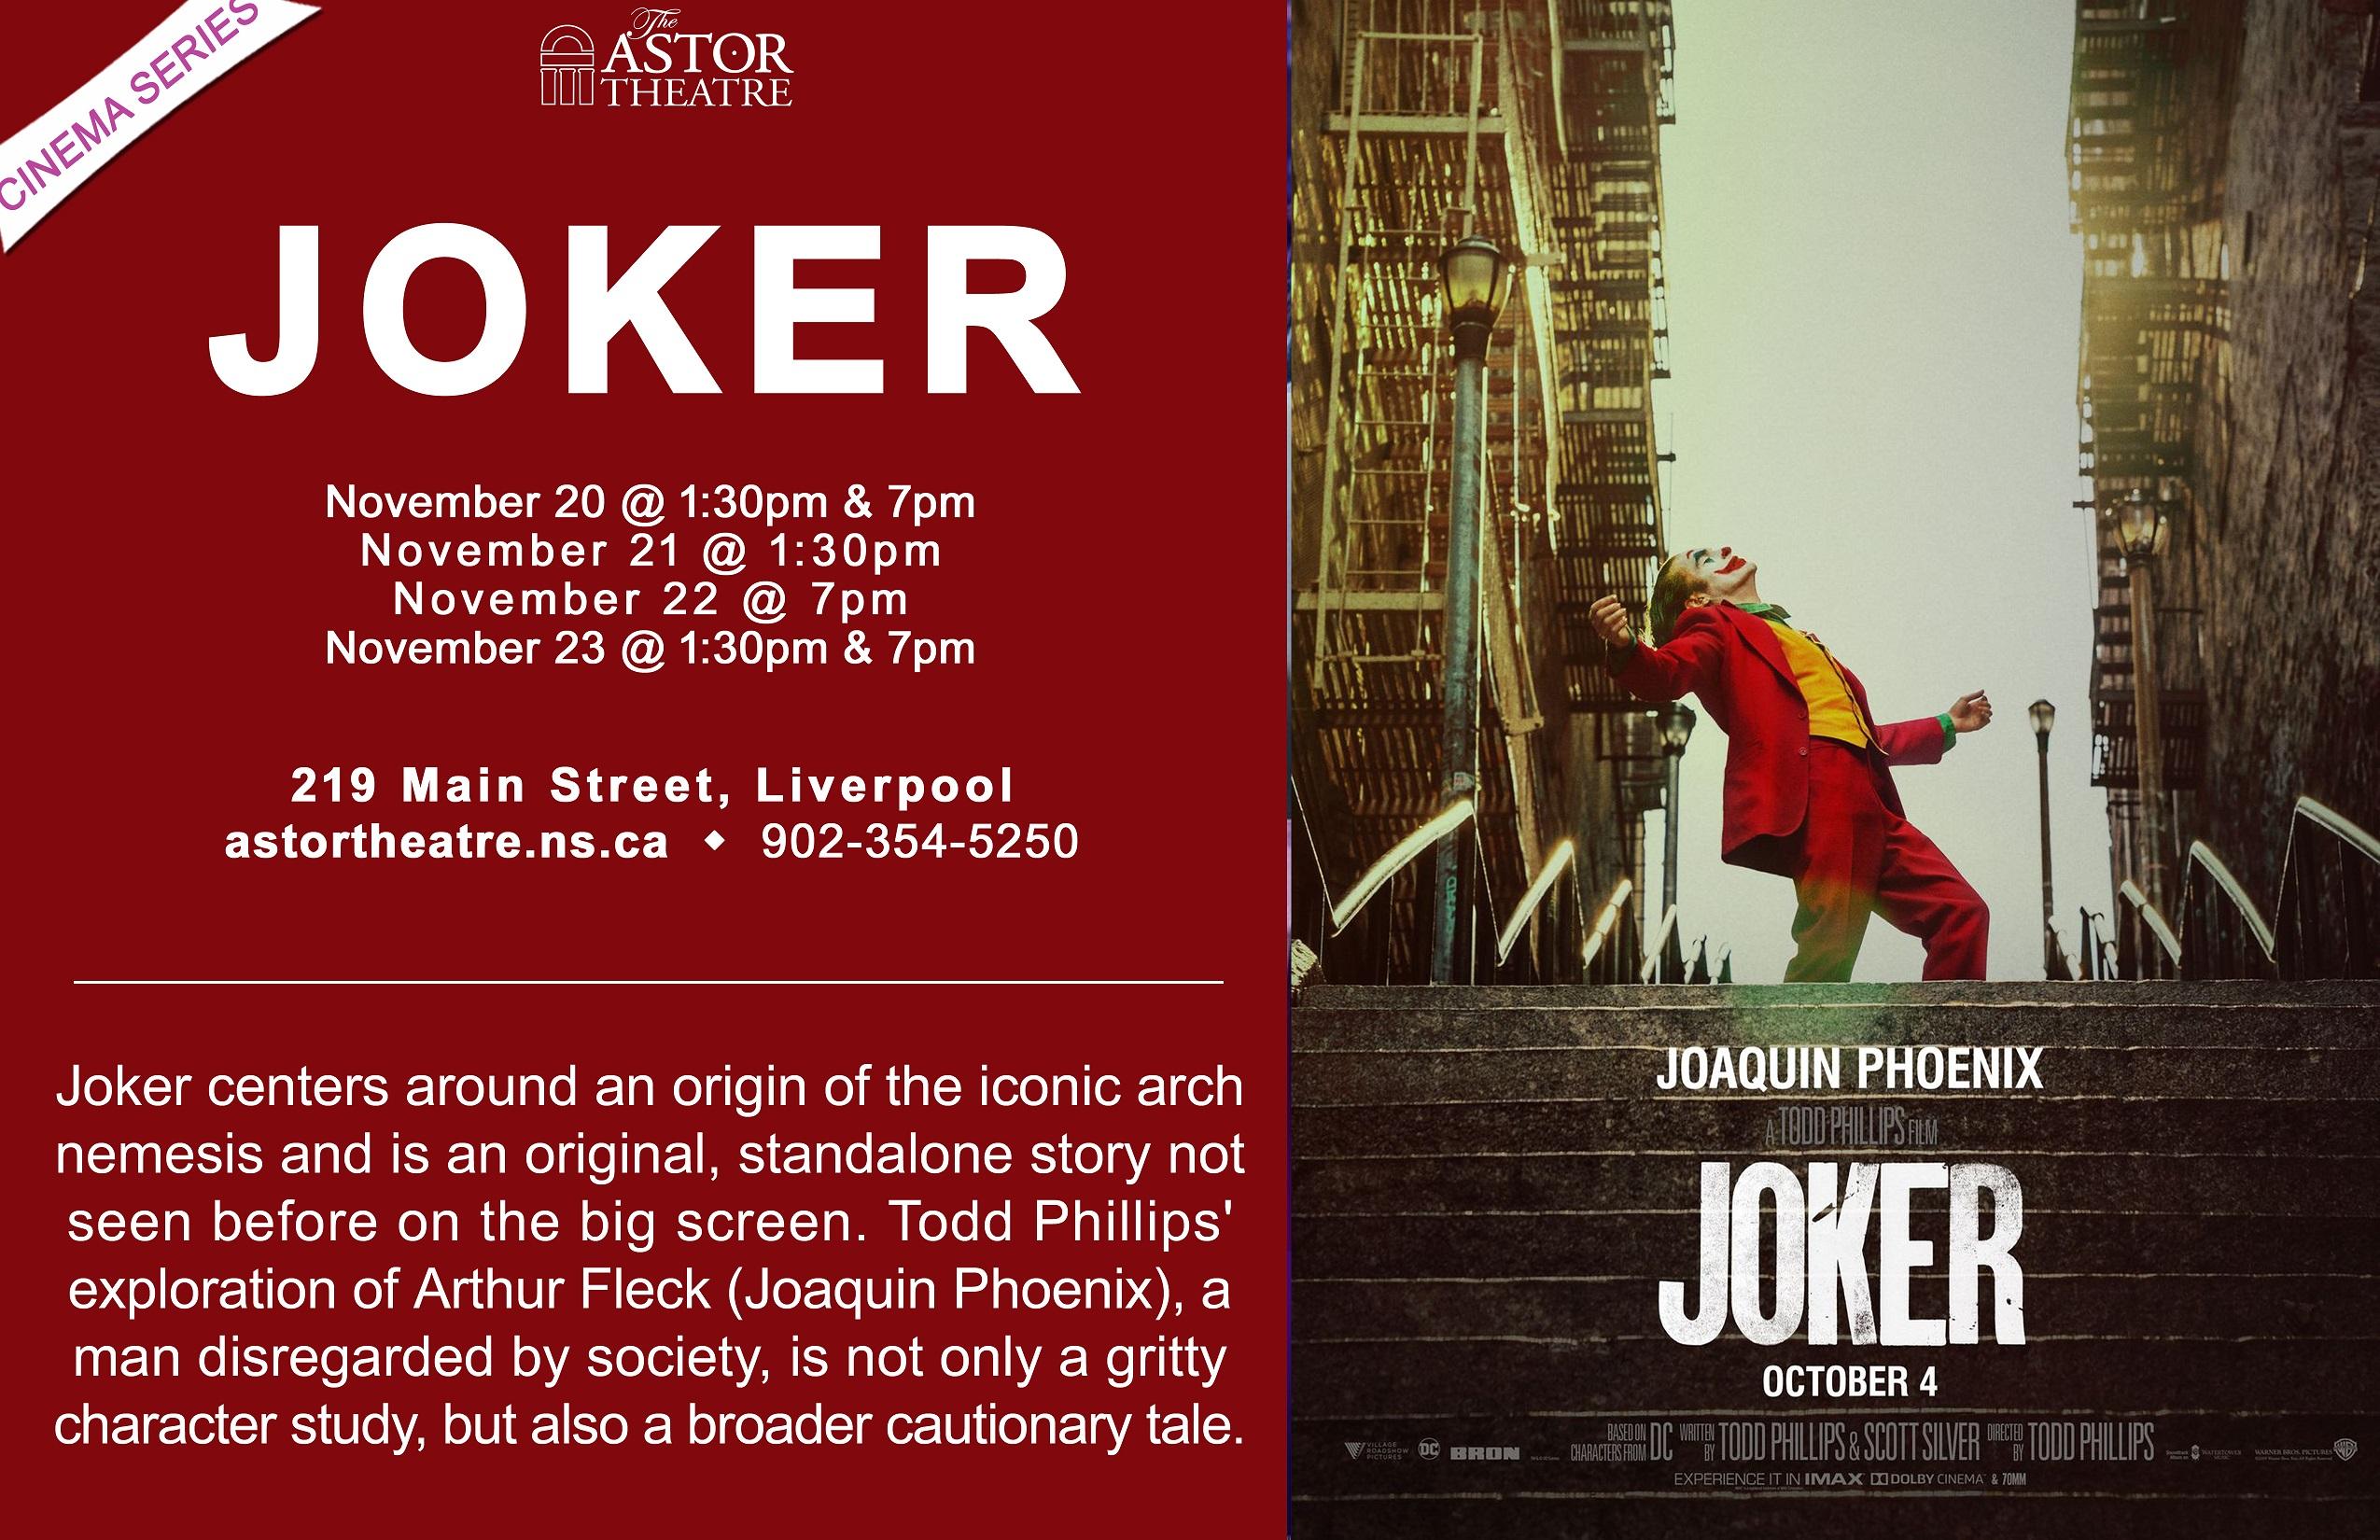 Joker - Nov. 20 & 23 1:30 & 7pm, Nov. 21 @ 1:30pm & Nov 22 @ 7pm @ Astor Theatre